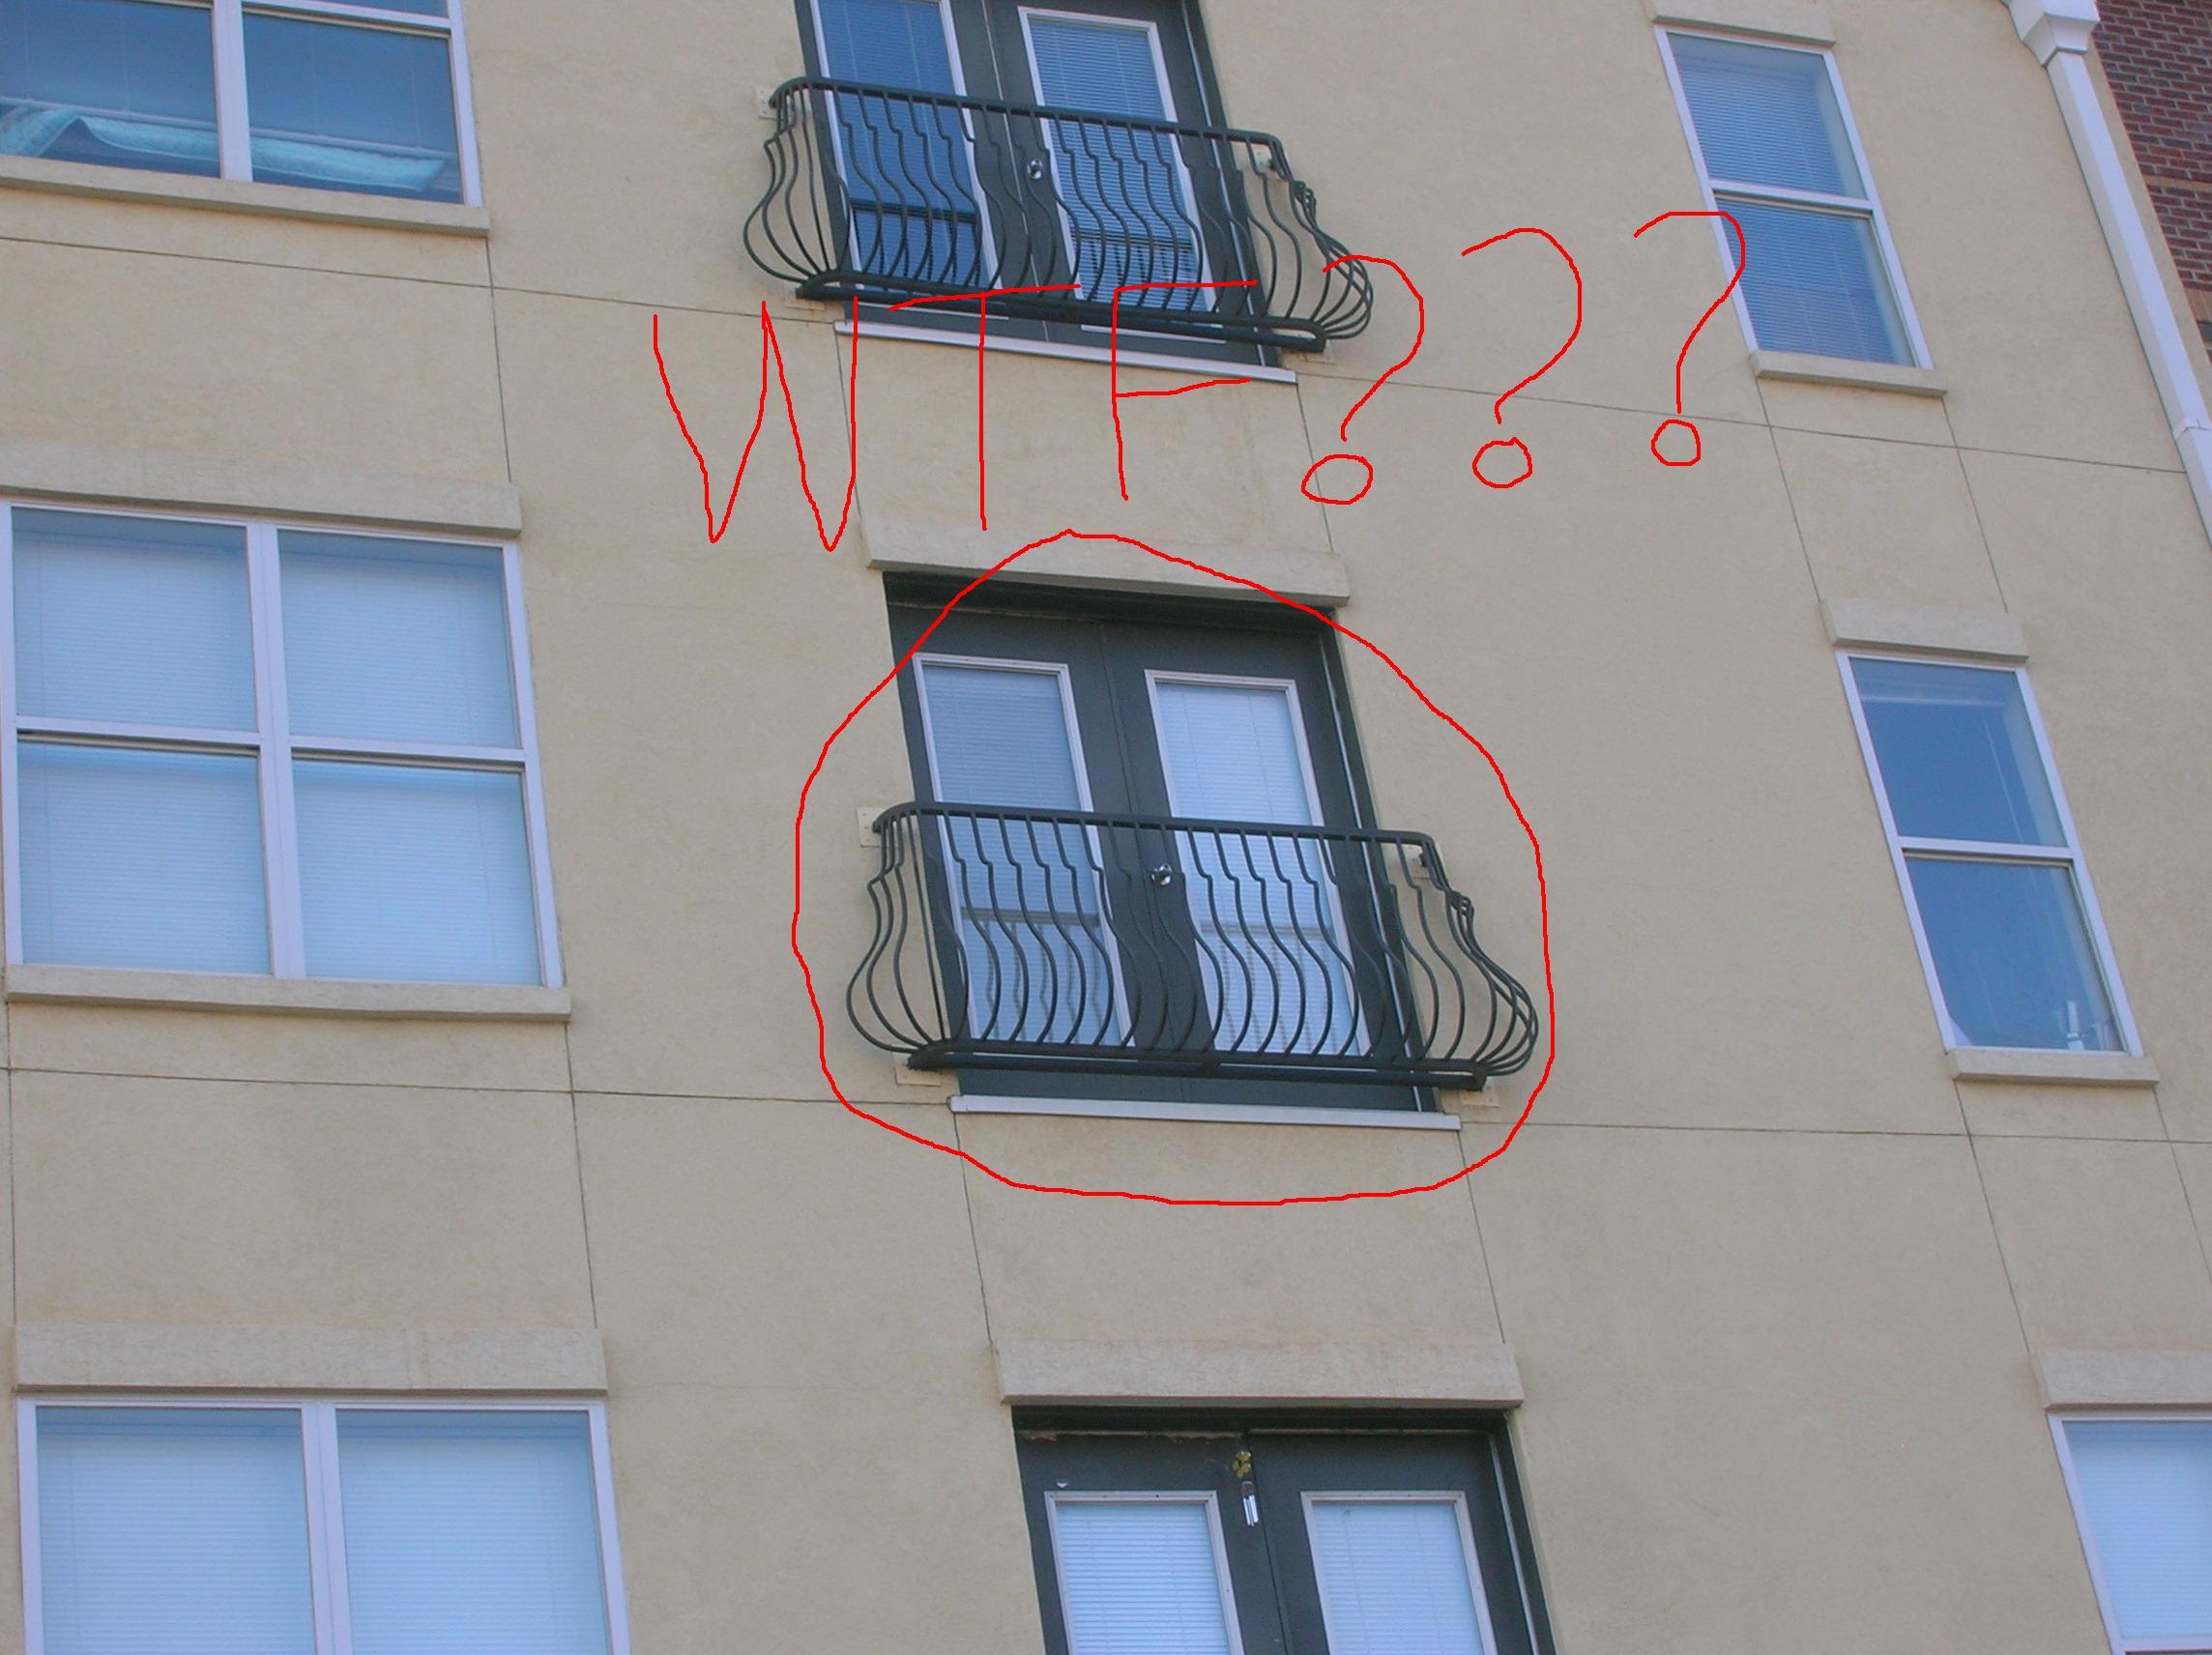 & Balcony Door but No Balcony \u2013 Everyone\u0027s Entitled to Joe\u0027s Opinion